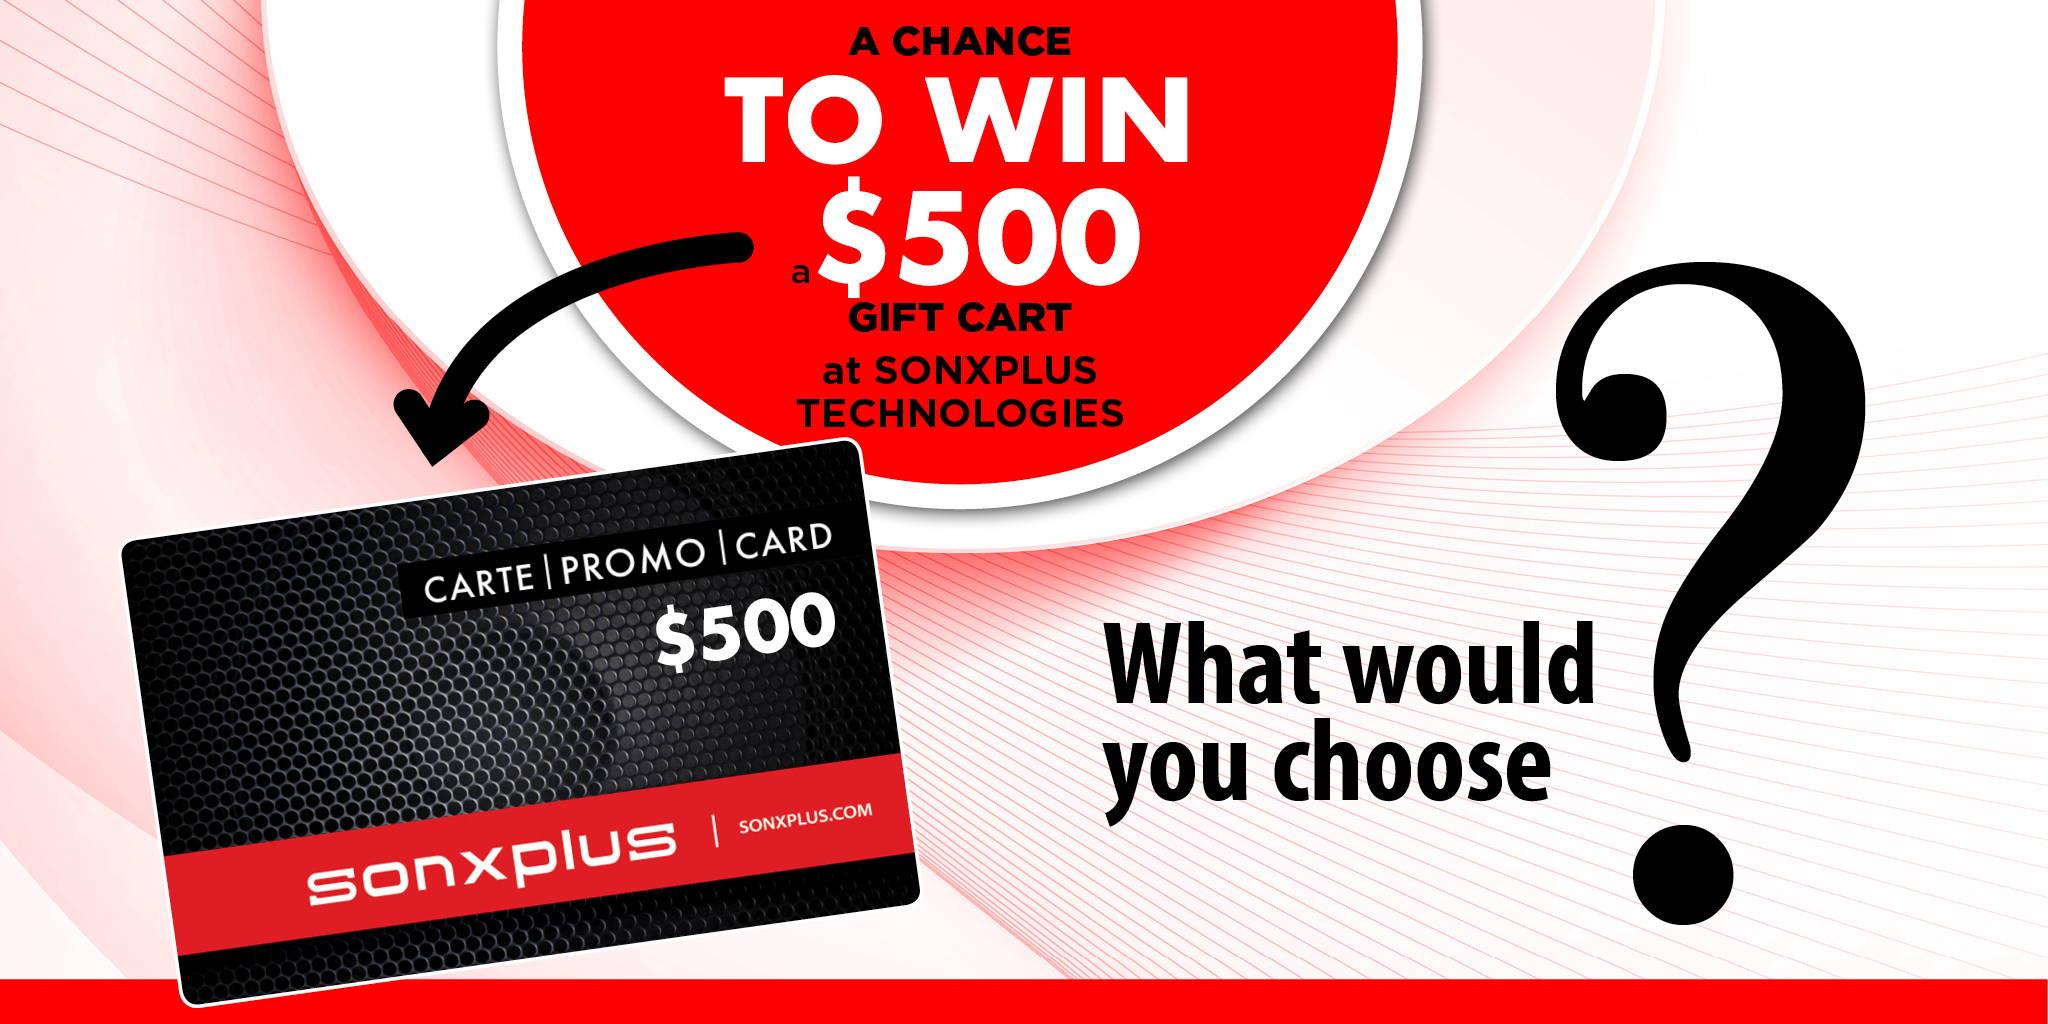 Win a 500$ promo card at sonxplus Technologies